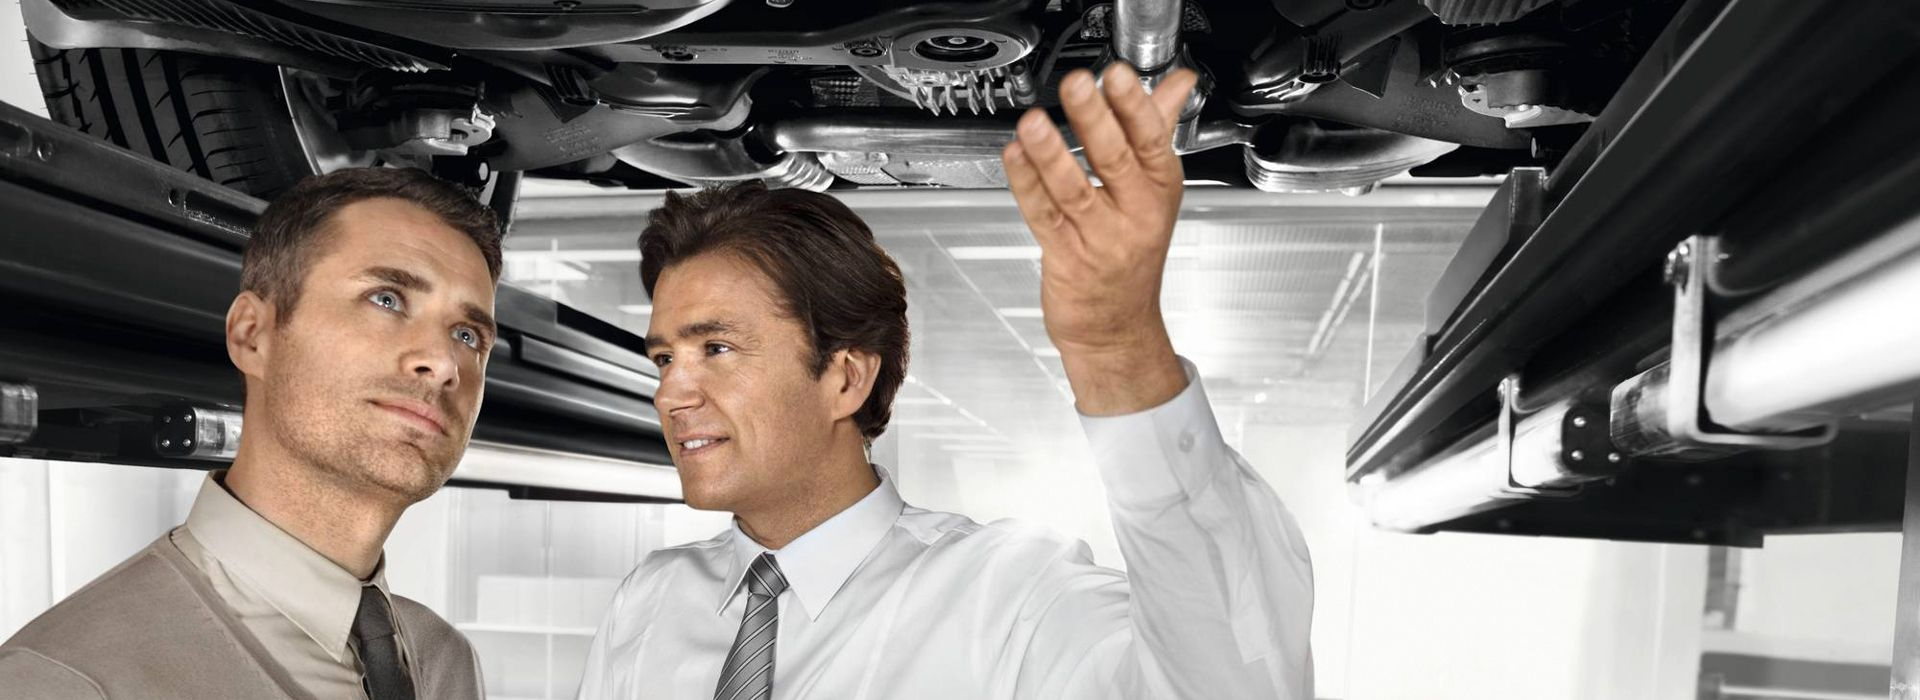 Audi Factory-Trained Technicians